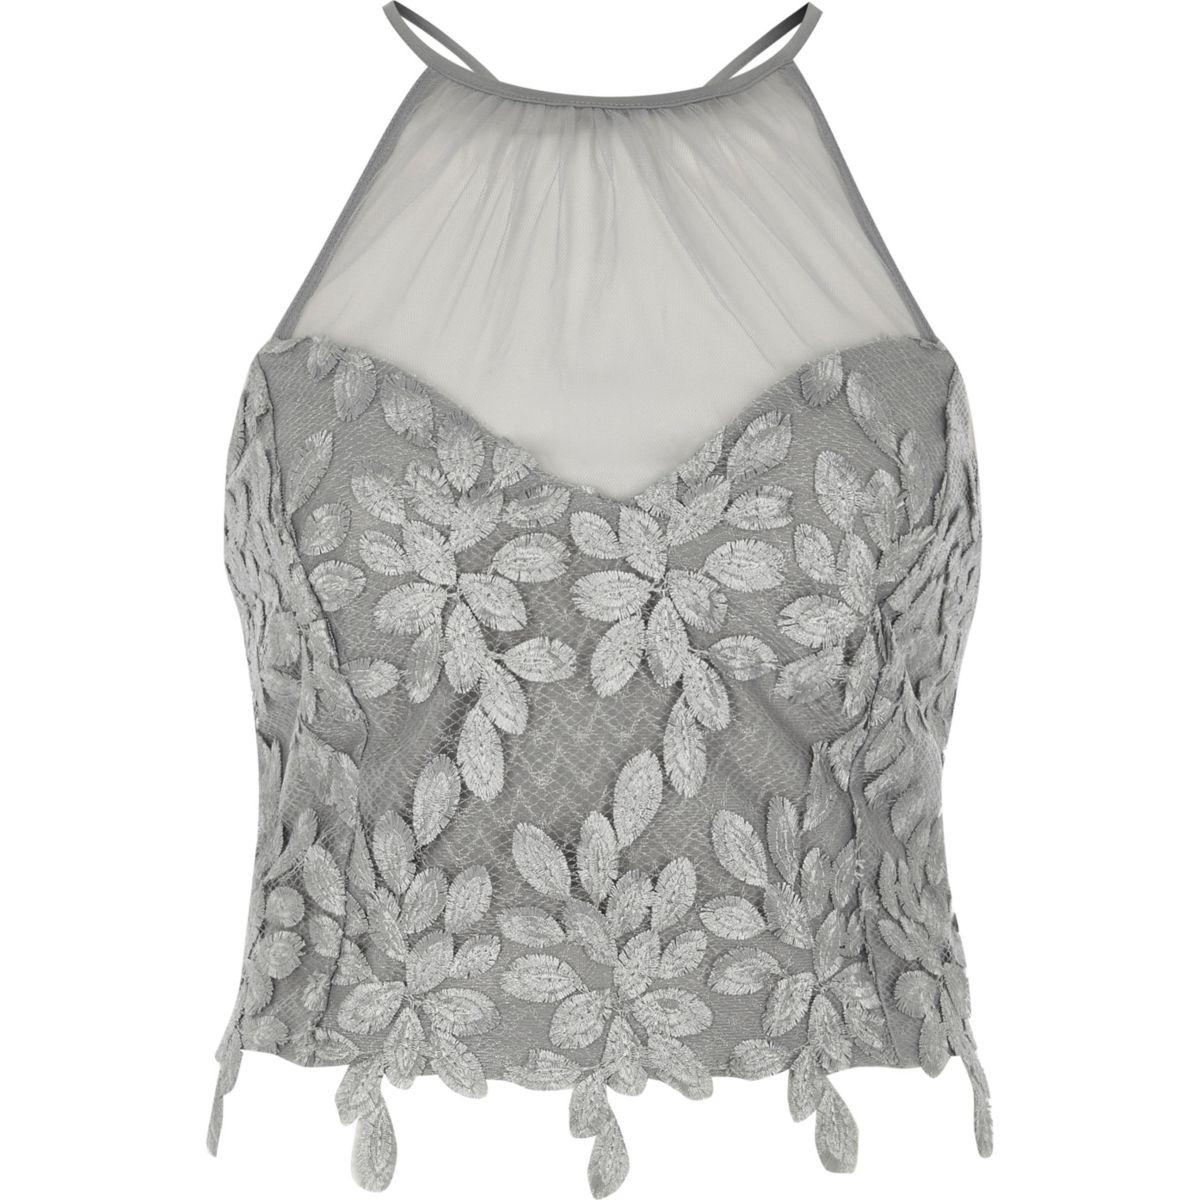 Silver floral mesh insert high neck bralet